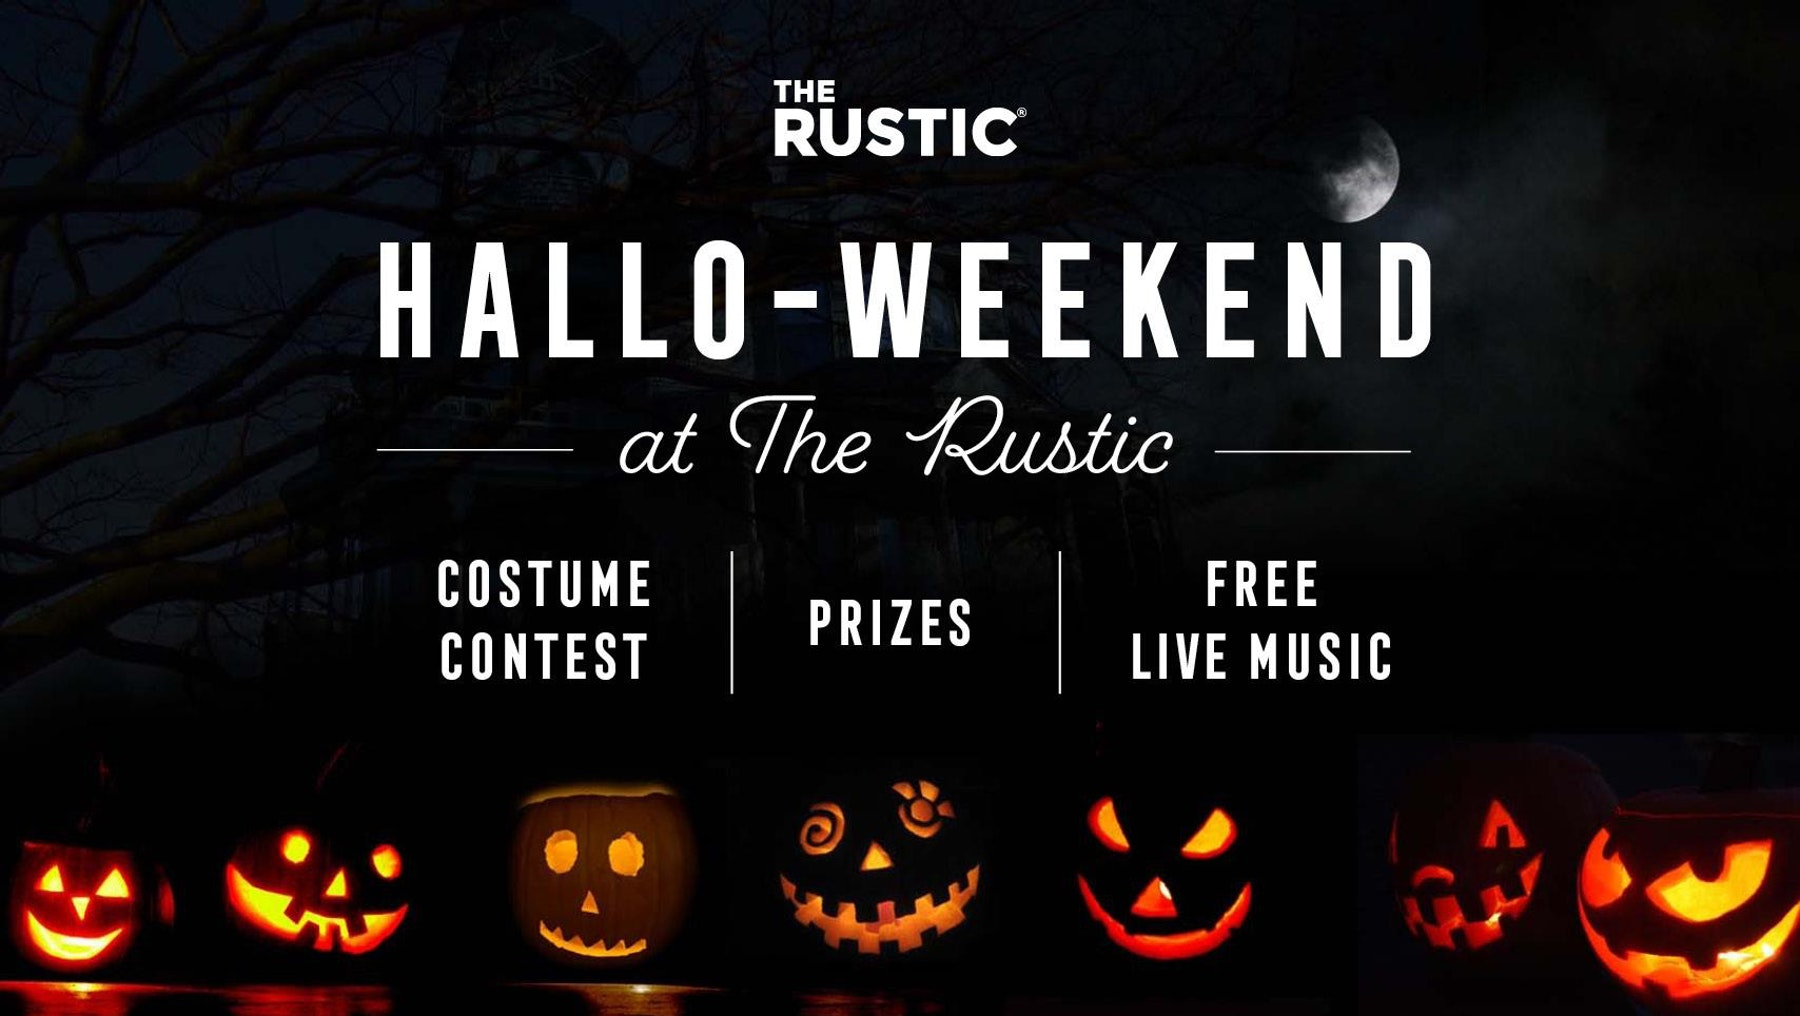 Halloween Weekend at The Rustic